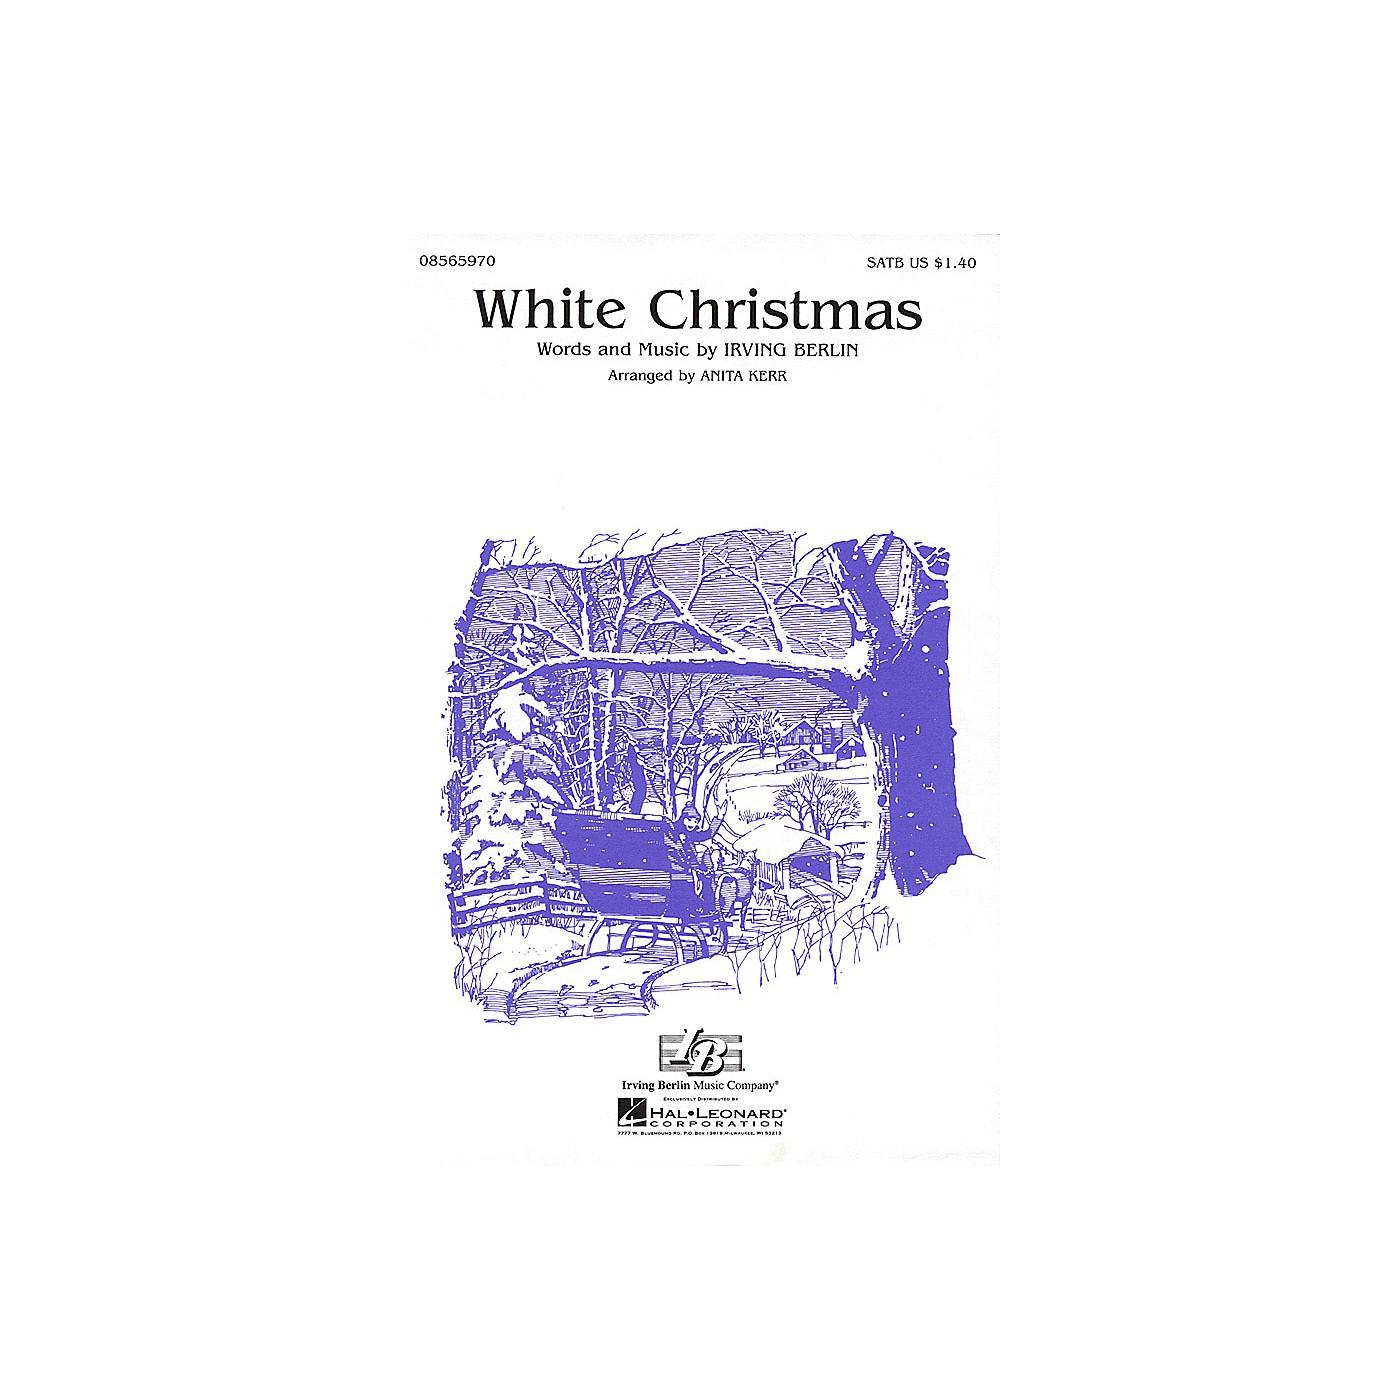 Hal Leonard White Christmas (SATB) SATB arranged by Anita Kerr thumbnail